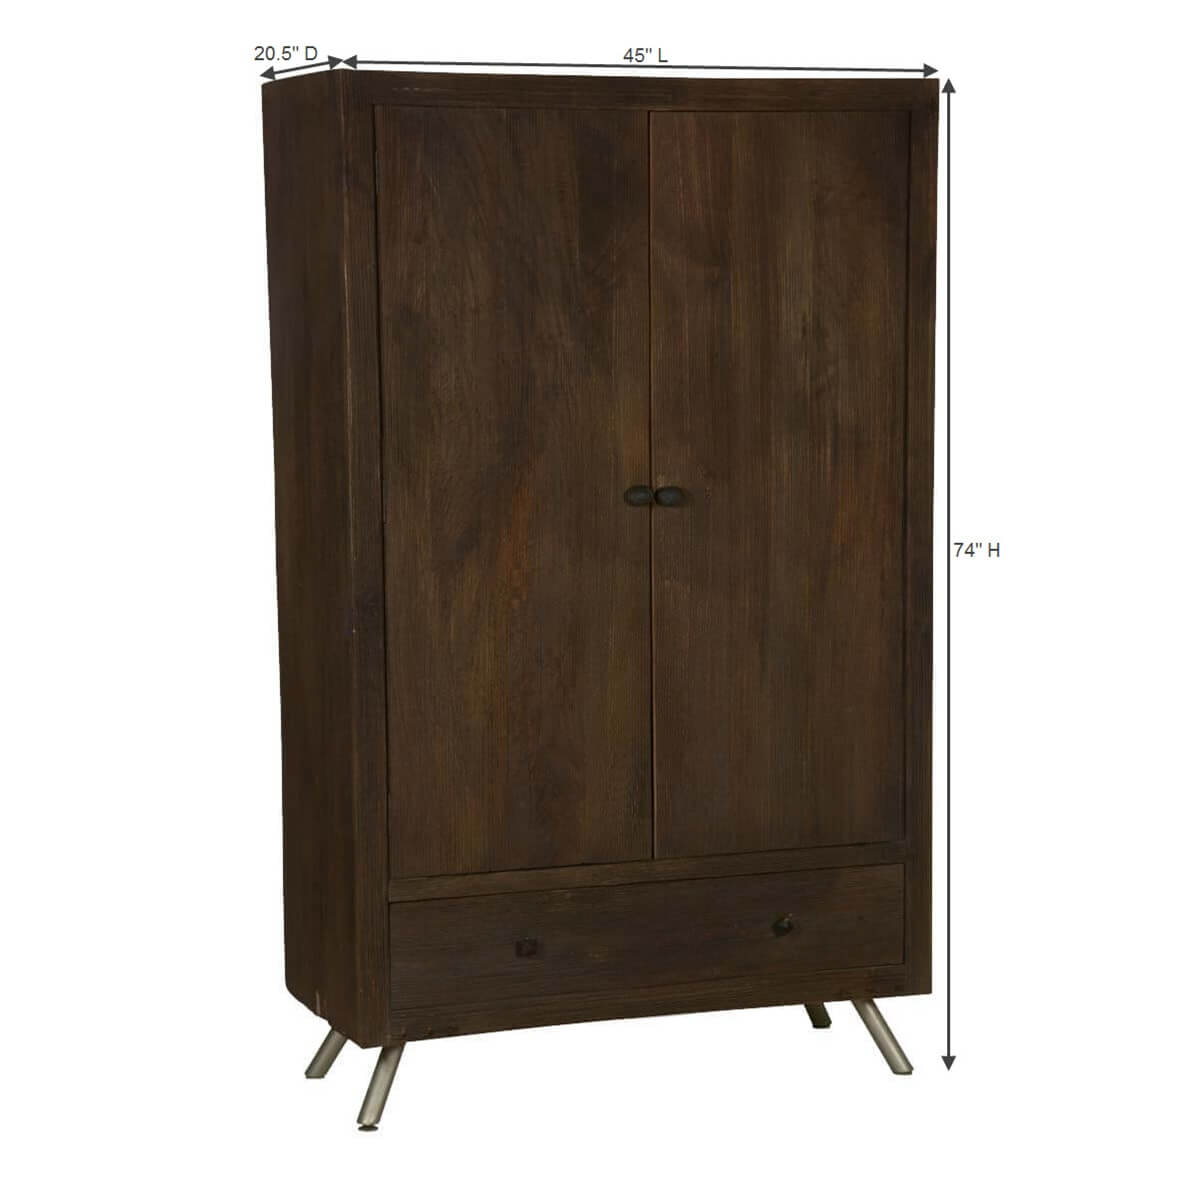 modern frontier mango wood freestanding wardrobe armoire. frontier mango wood freestanding wardrobe armoire